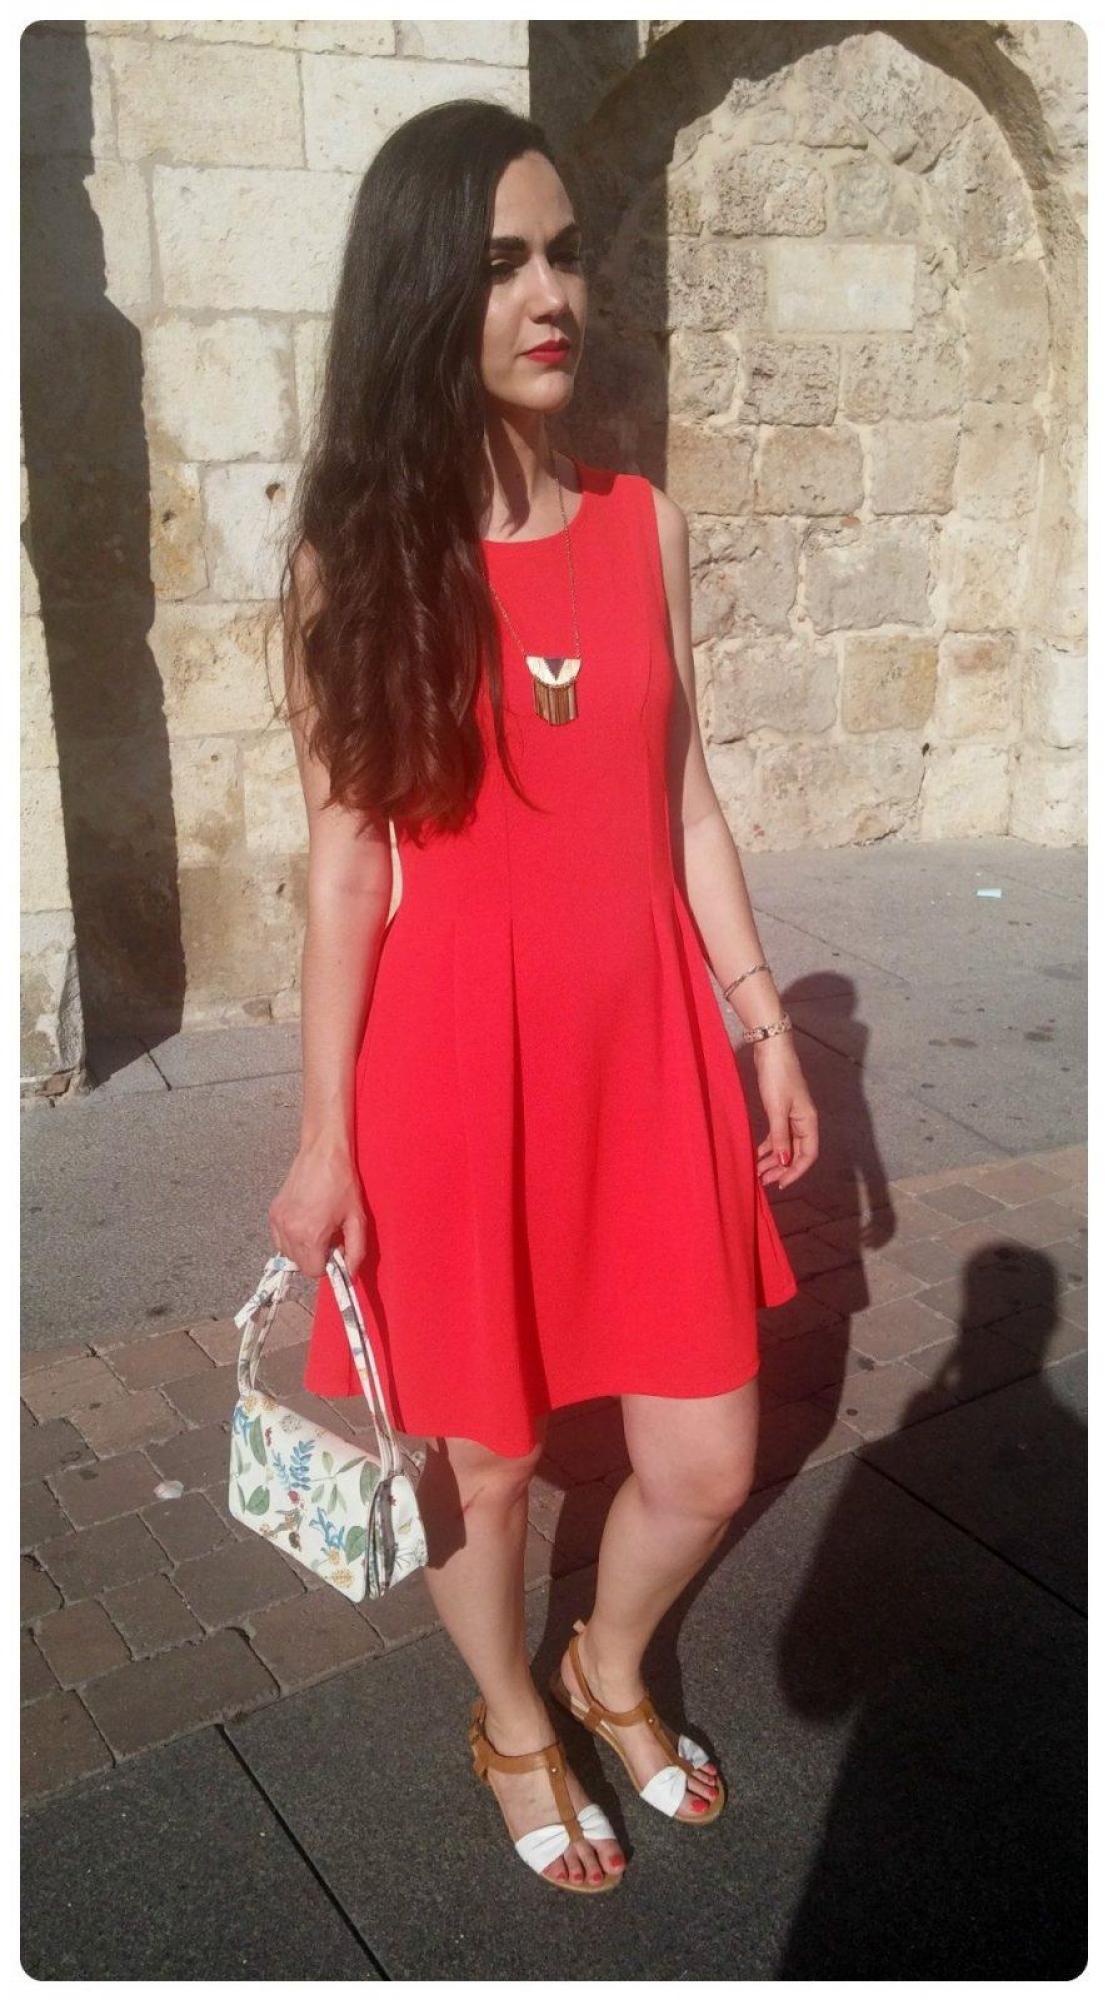 marikowskaya street style eneri vestido rojo (1)